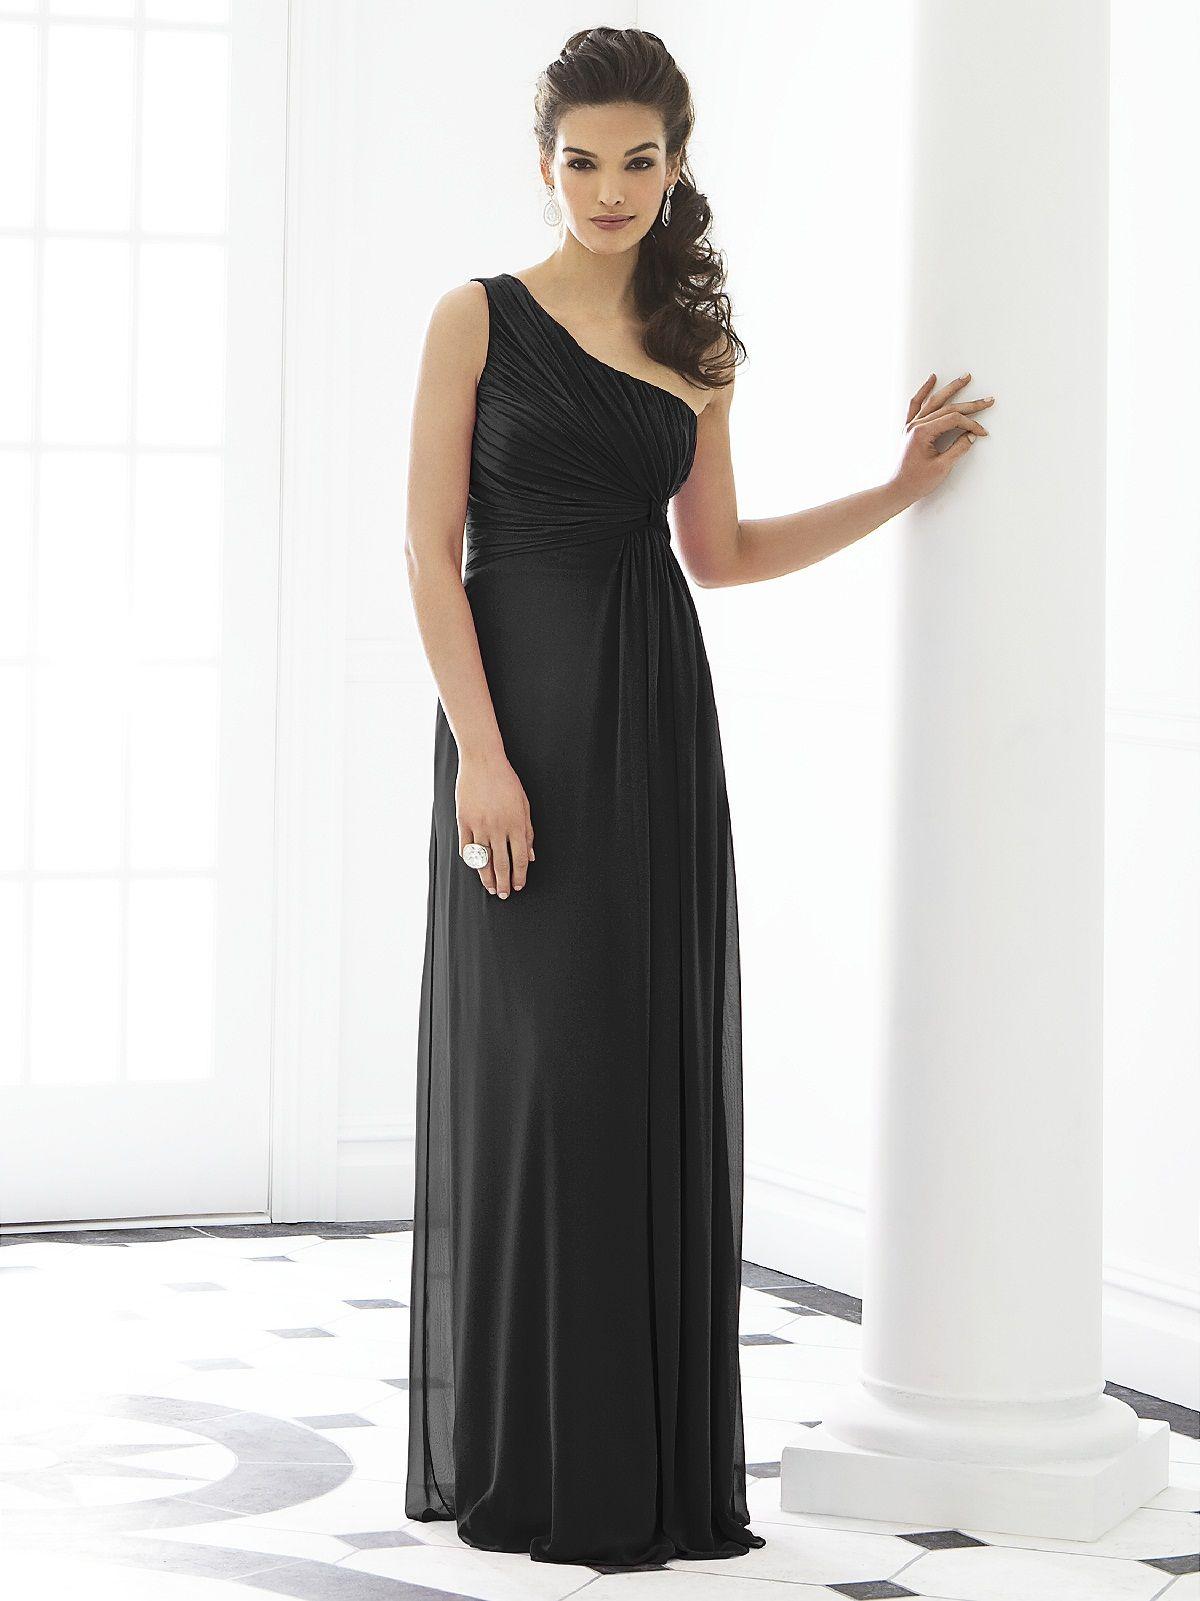 After six bridesmaid dress long black bridesmaid dresses